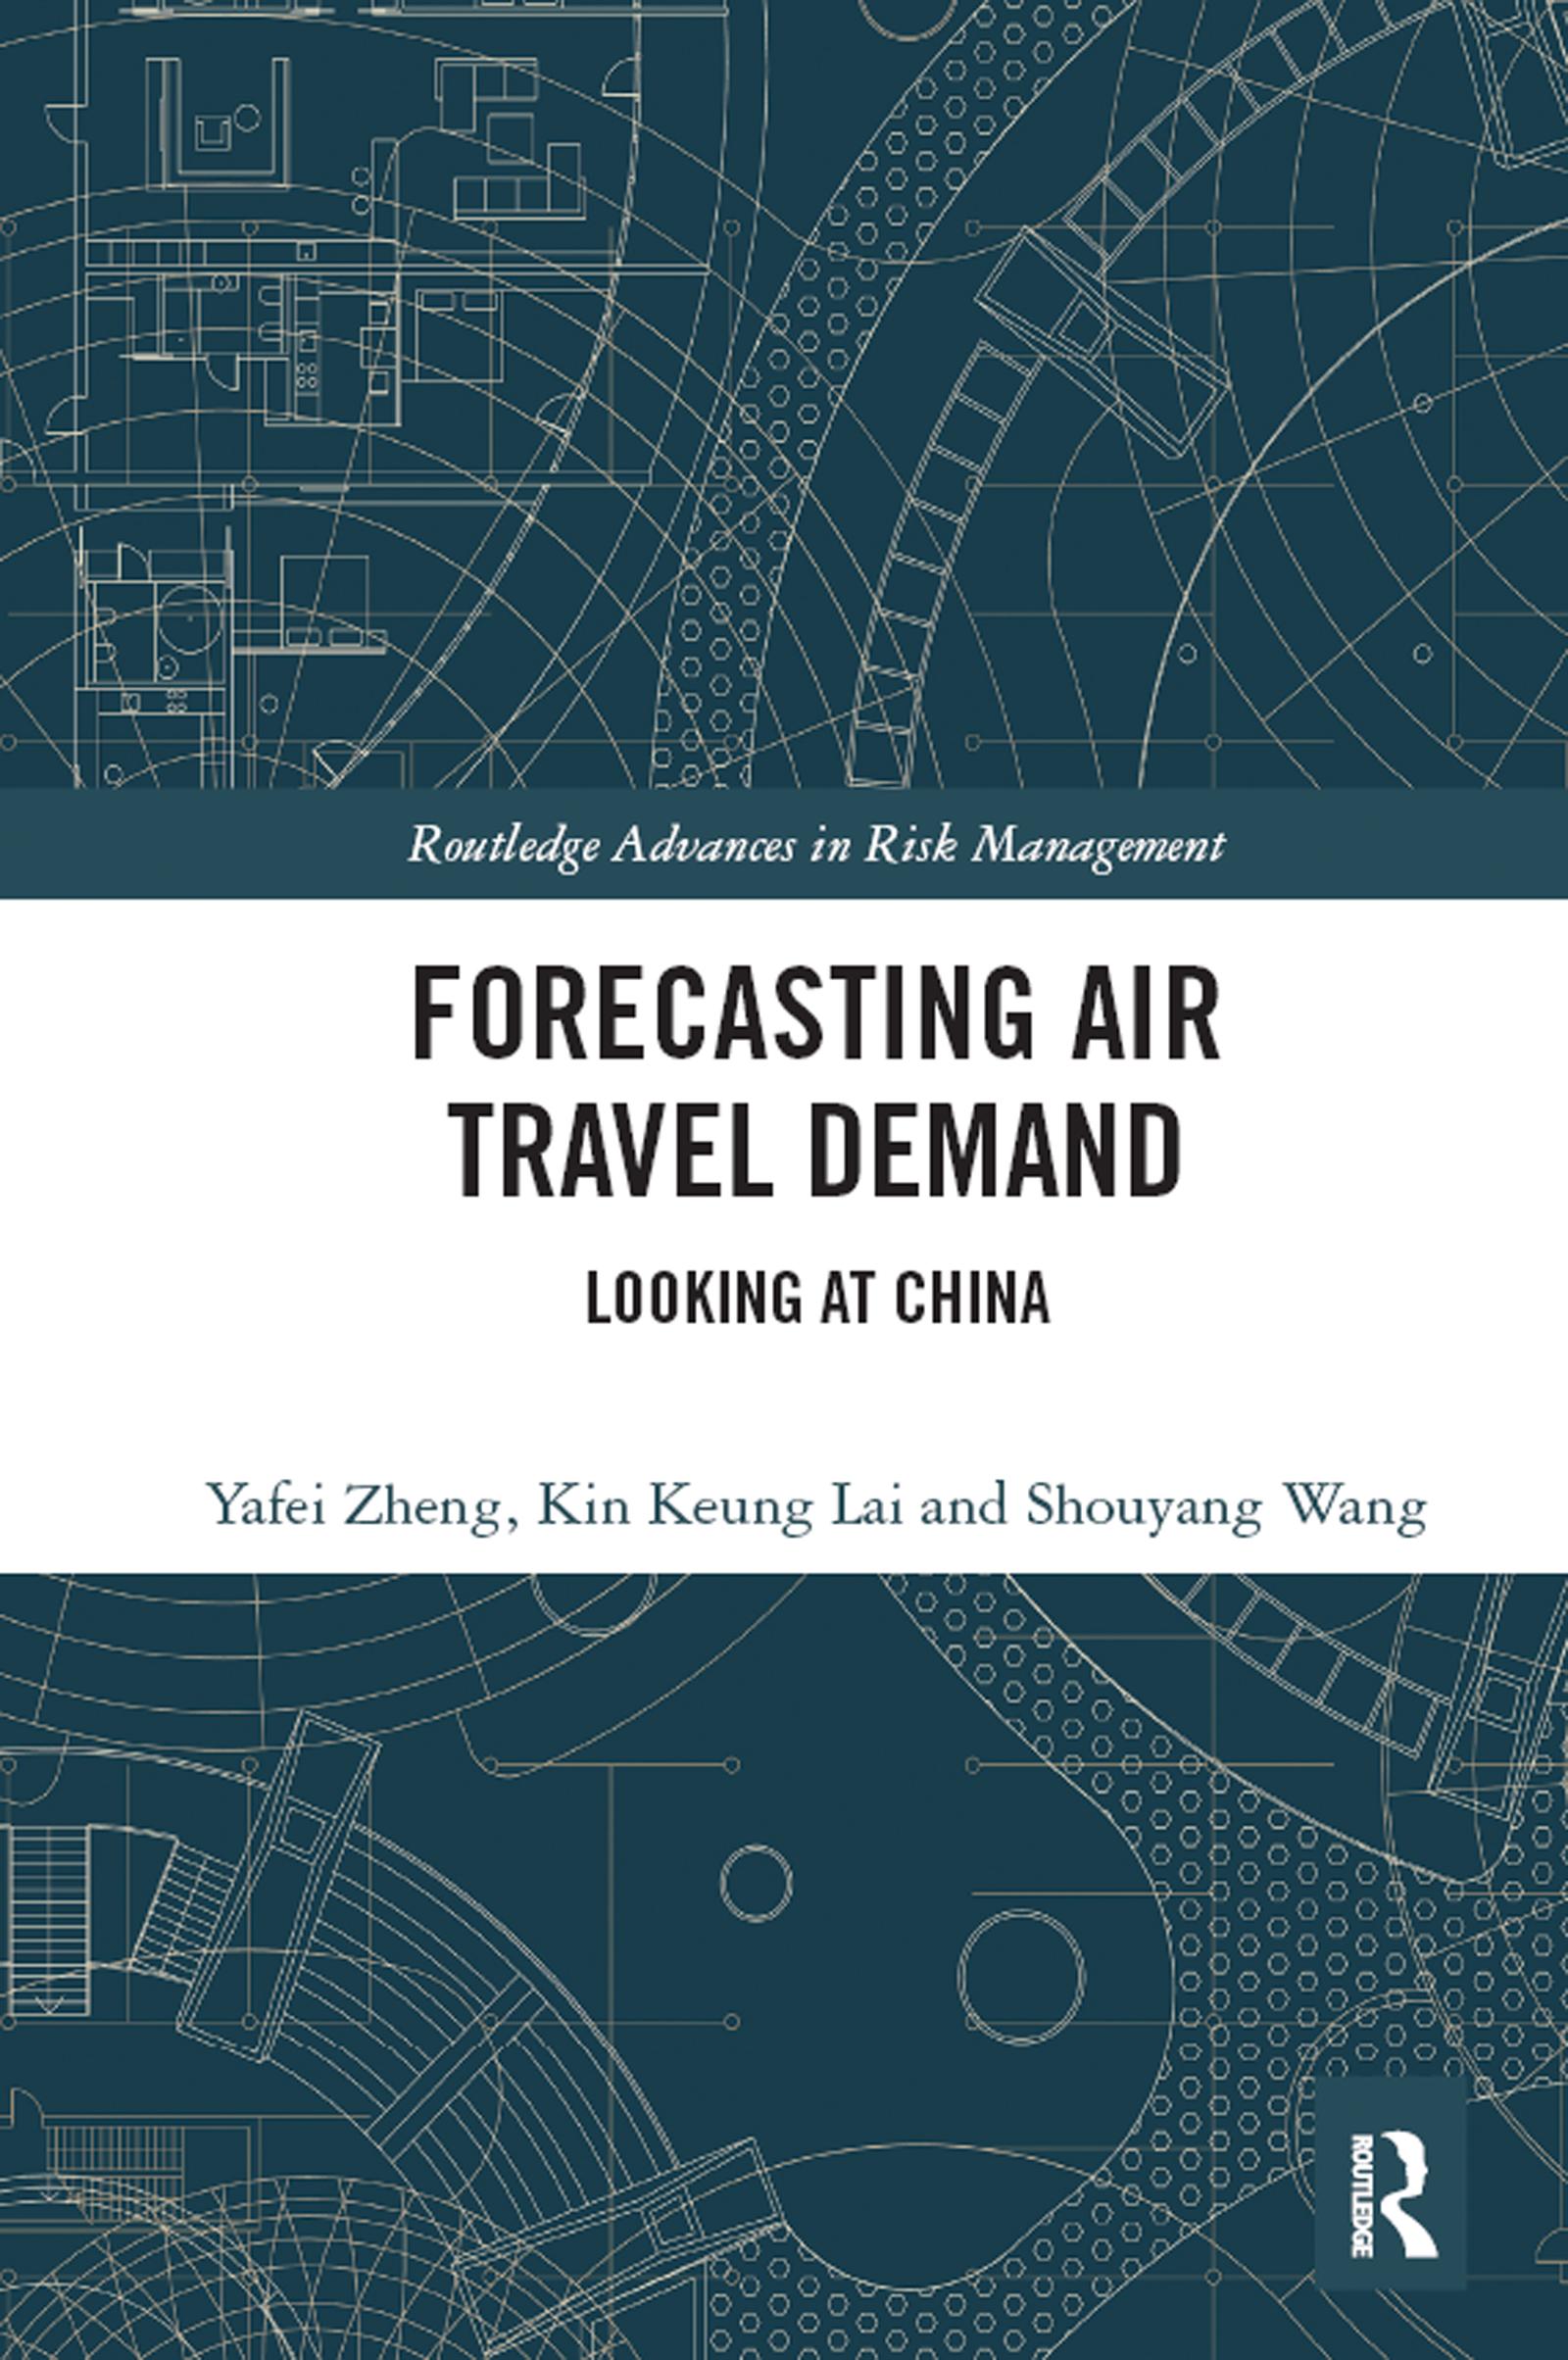 Forecasting Air Travel Demand: Looking at China book cover